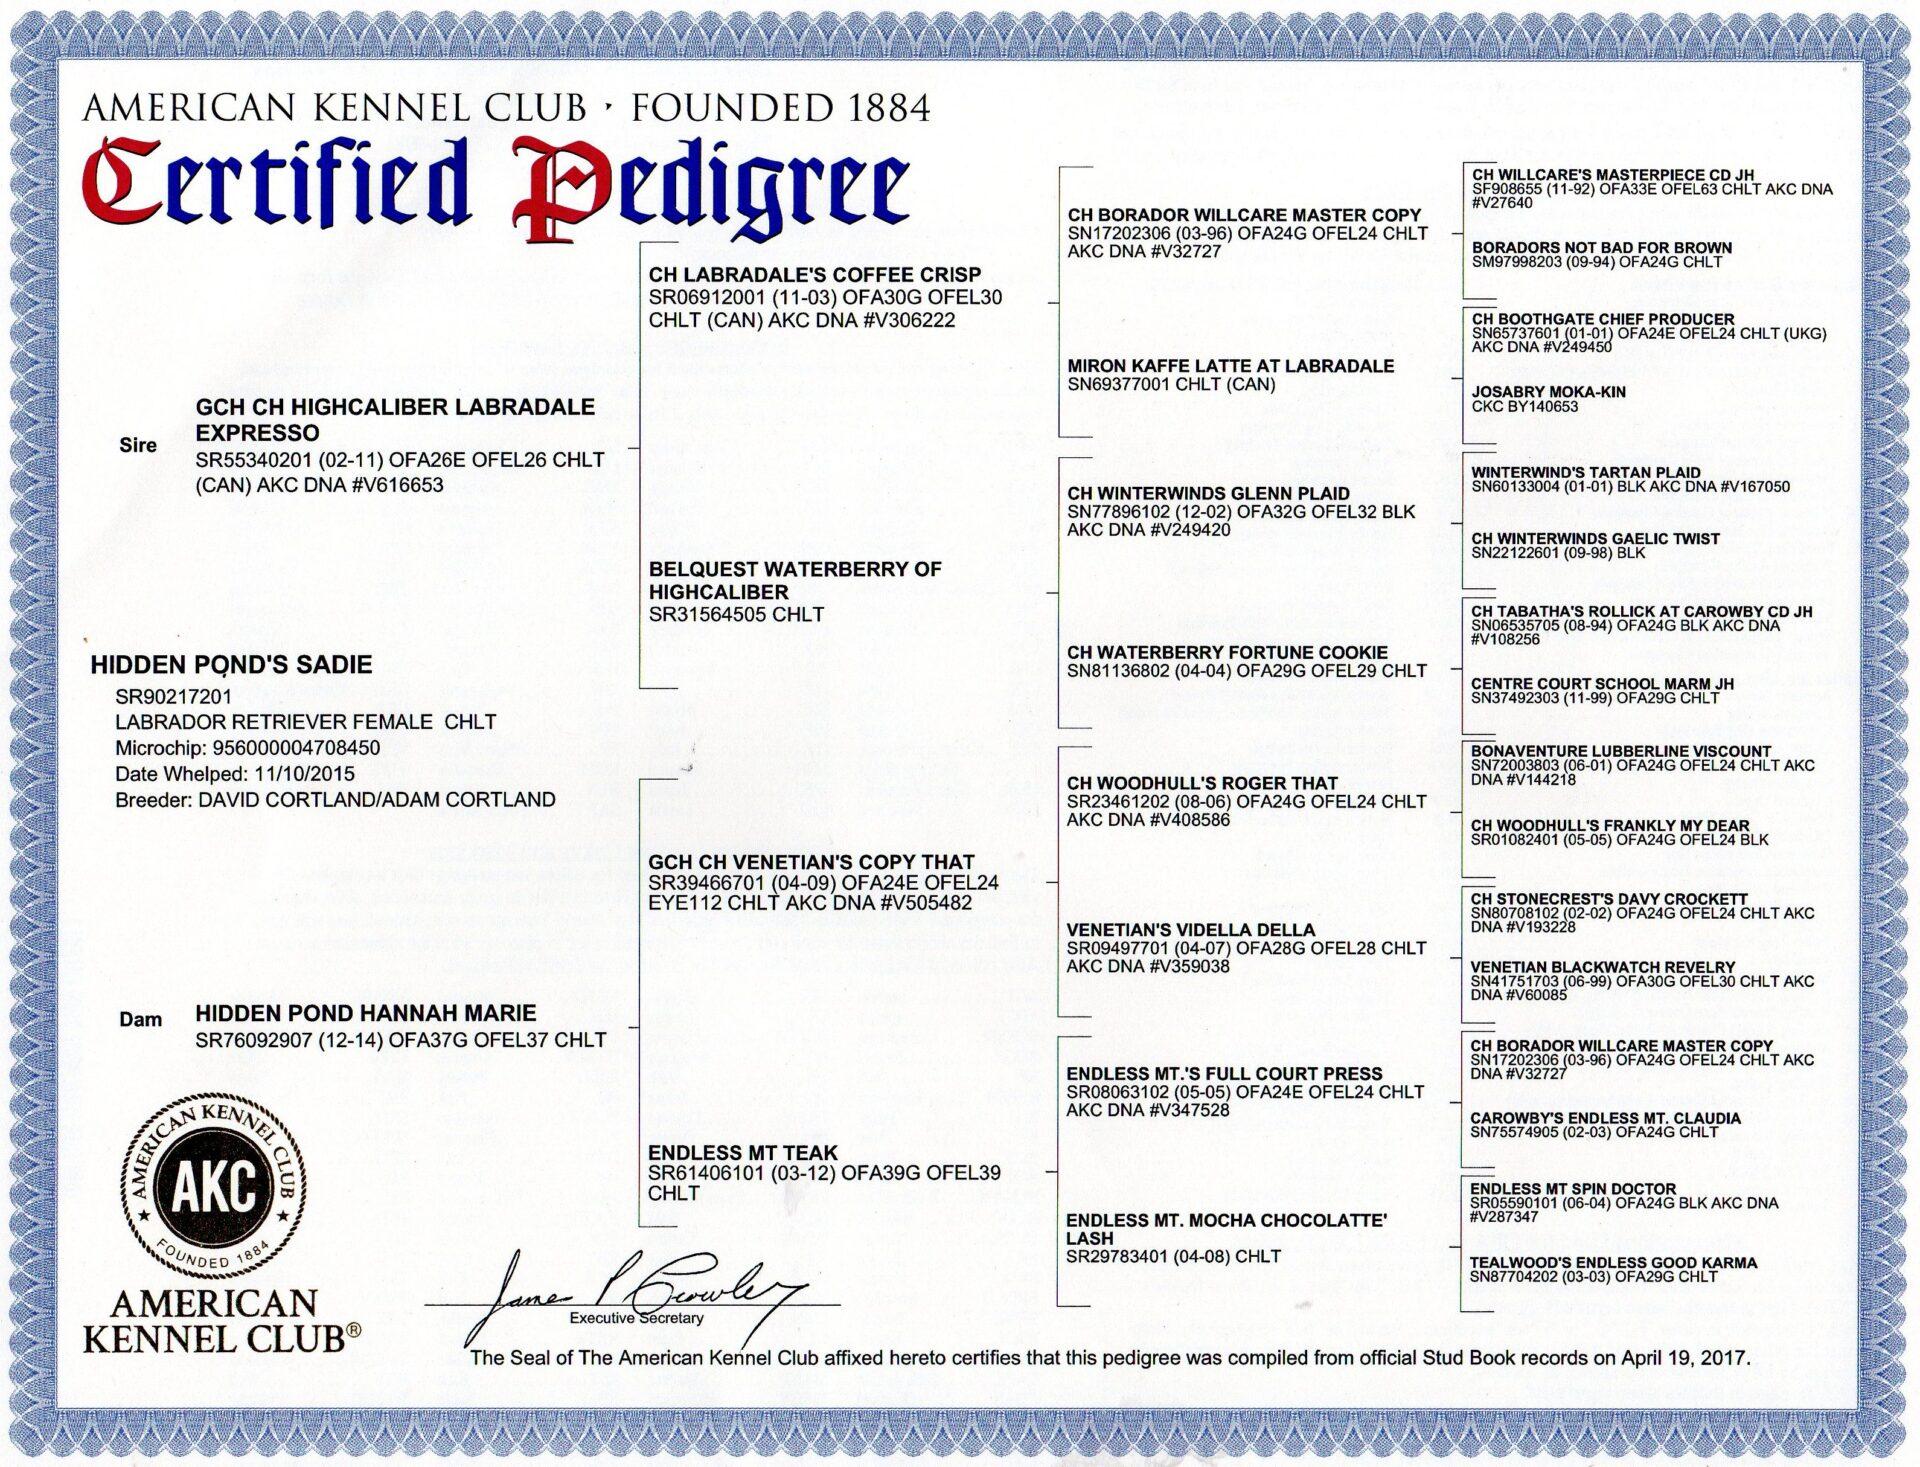 AKC Certified Pedigree Certificate